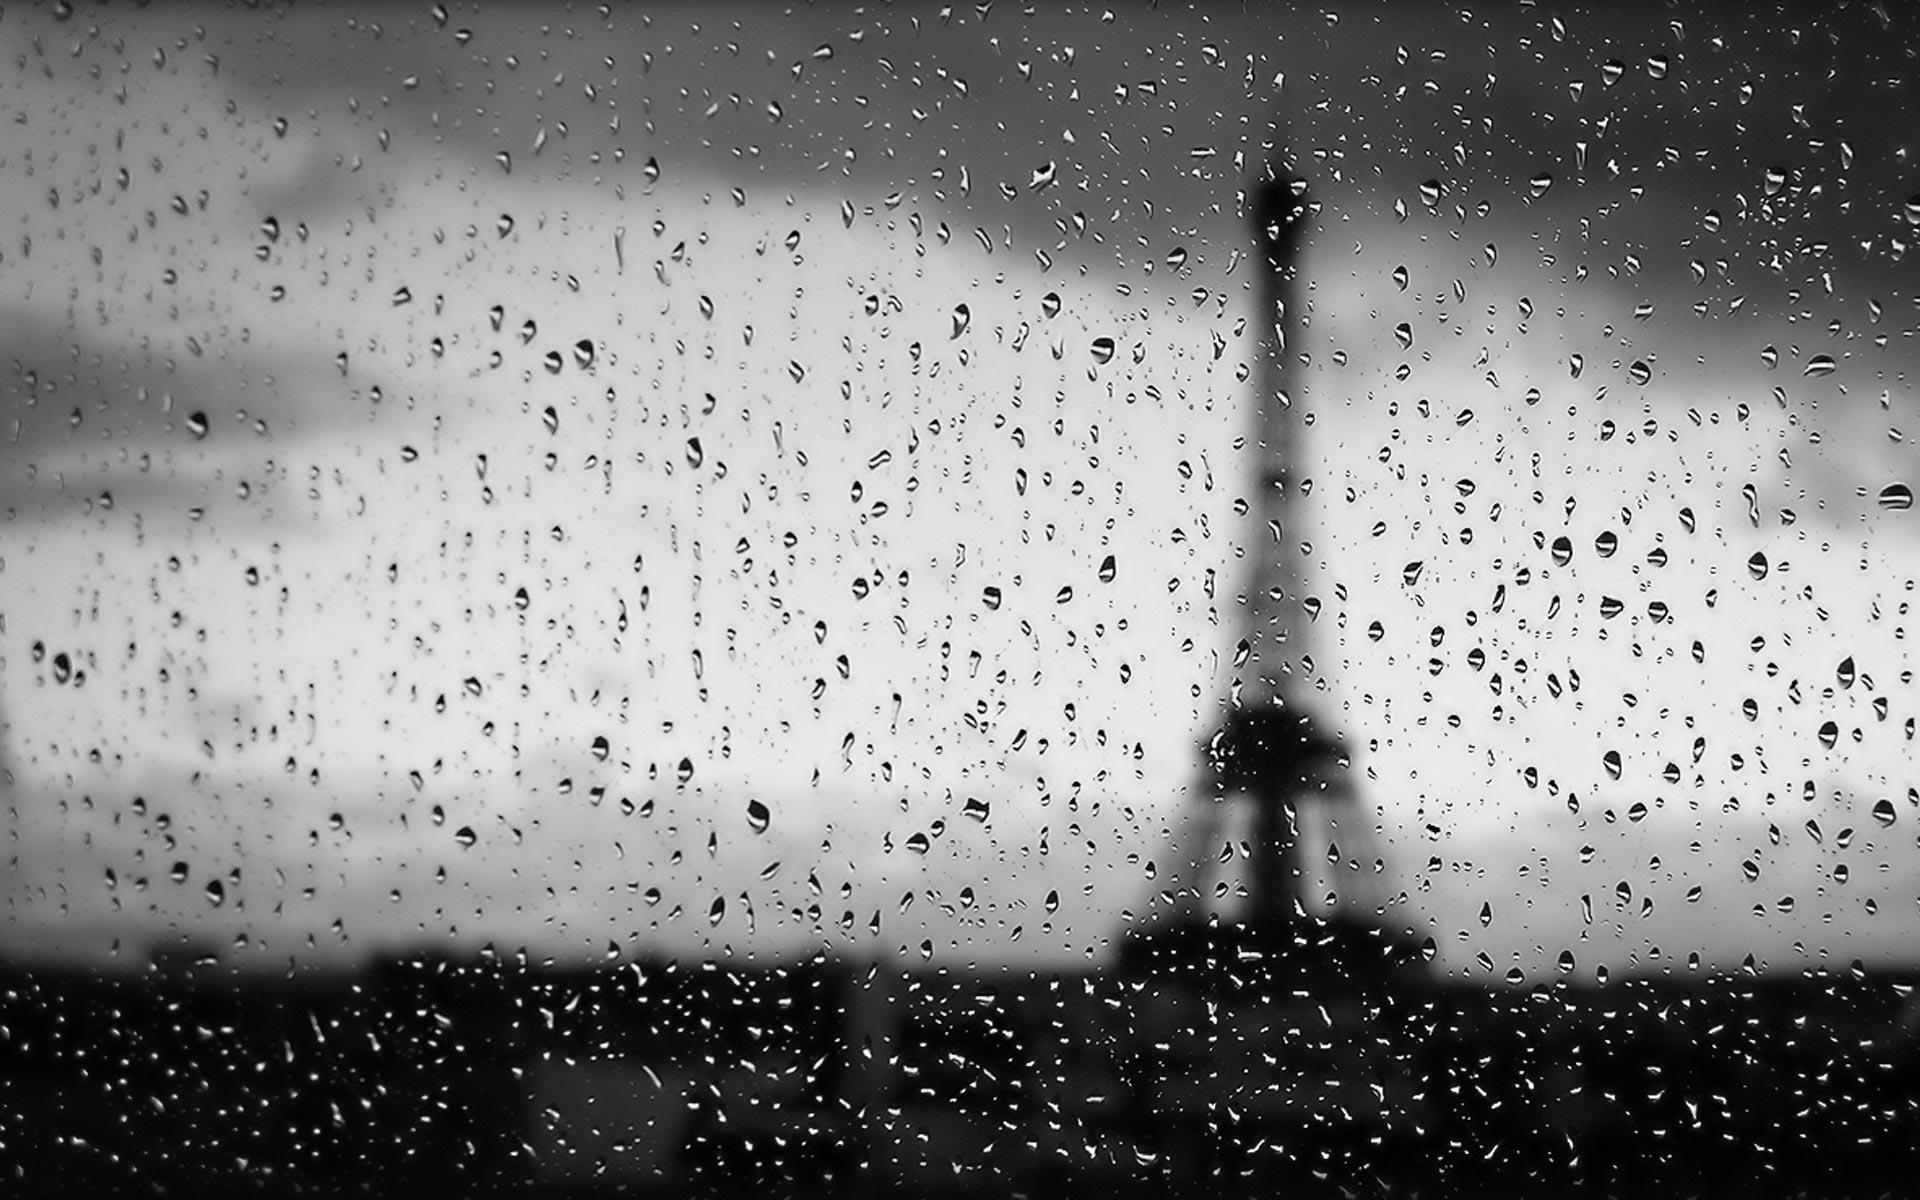 Hd wallpaper rain - City Rain Beautiful Landscape Nature Wallpaper